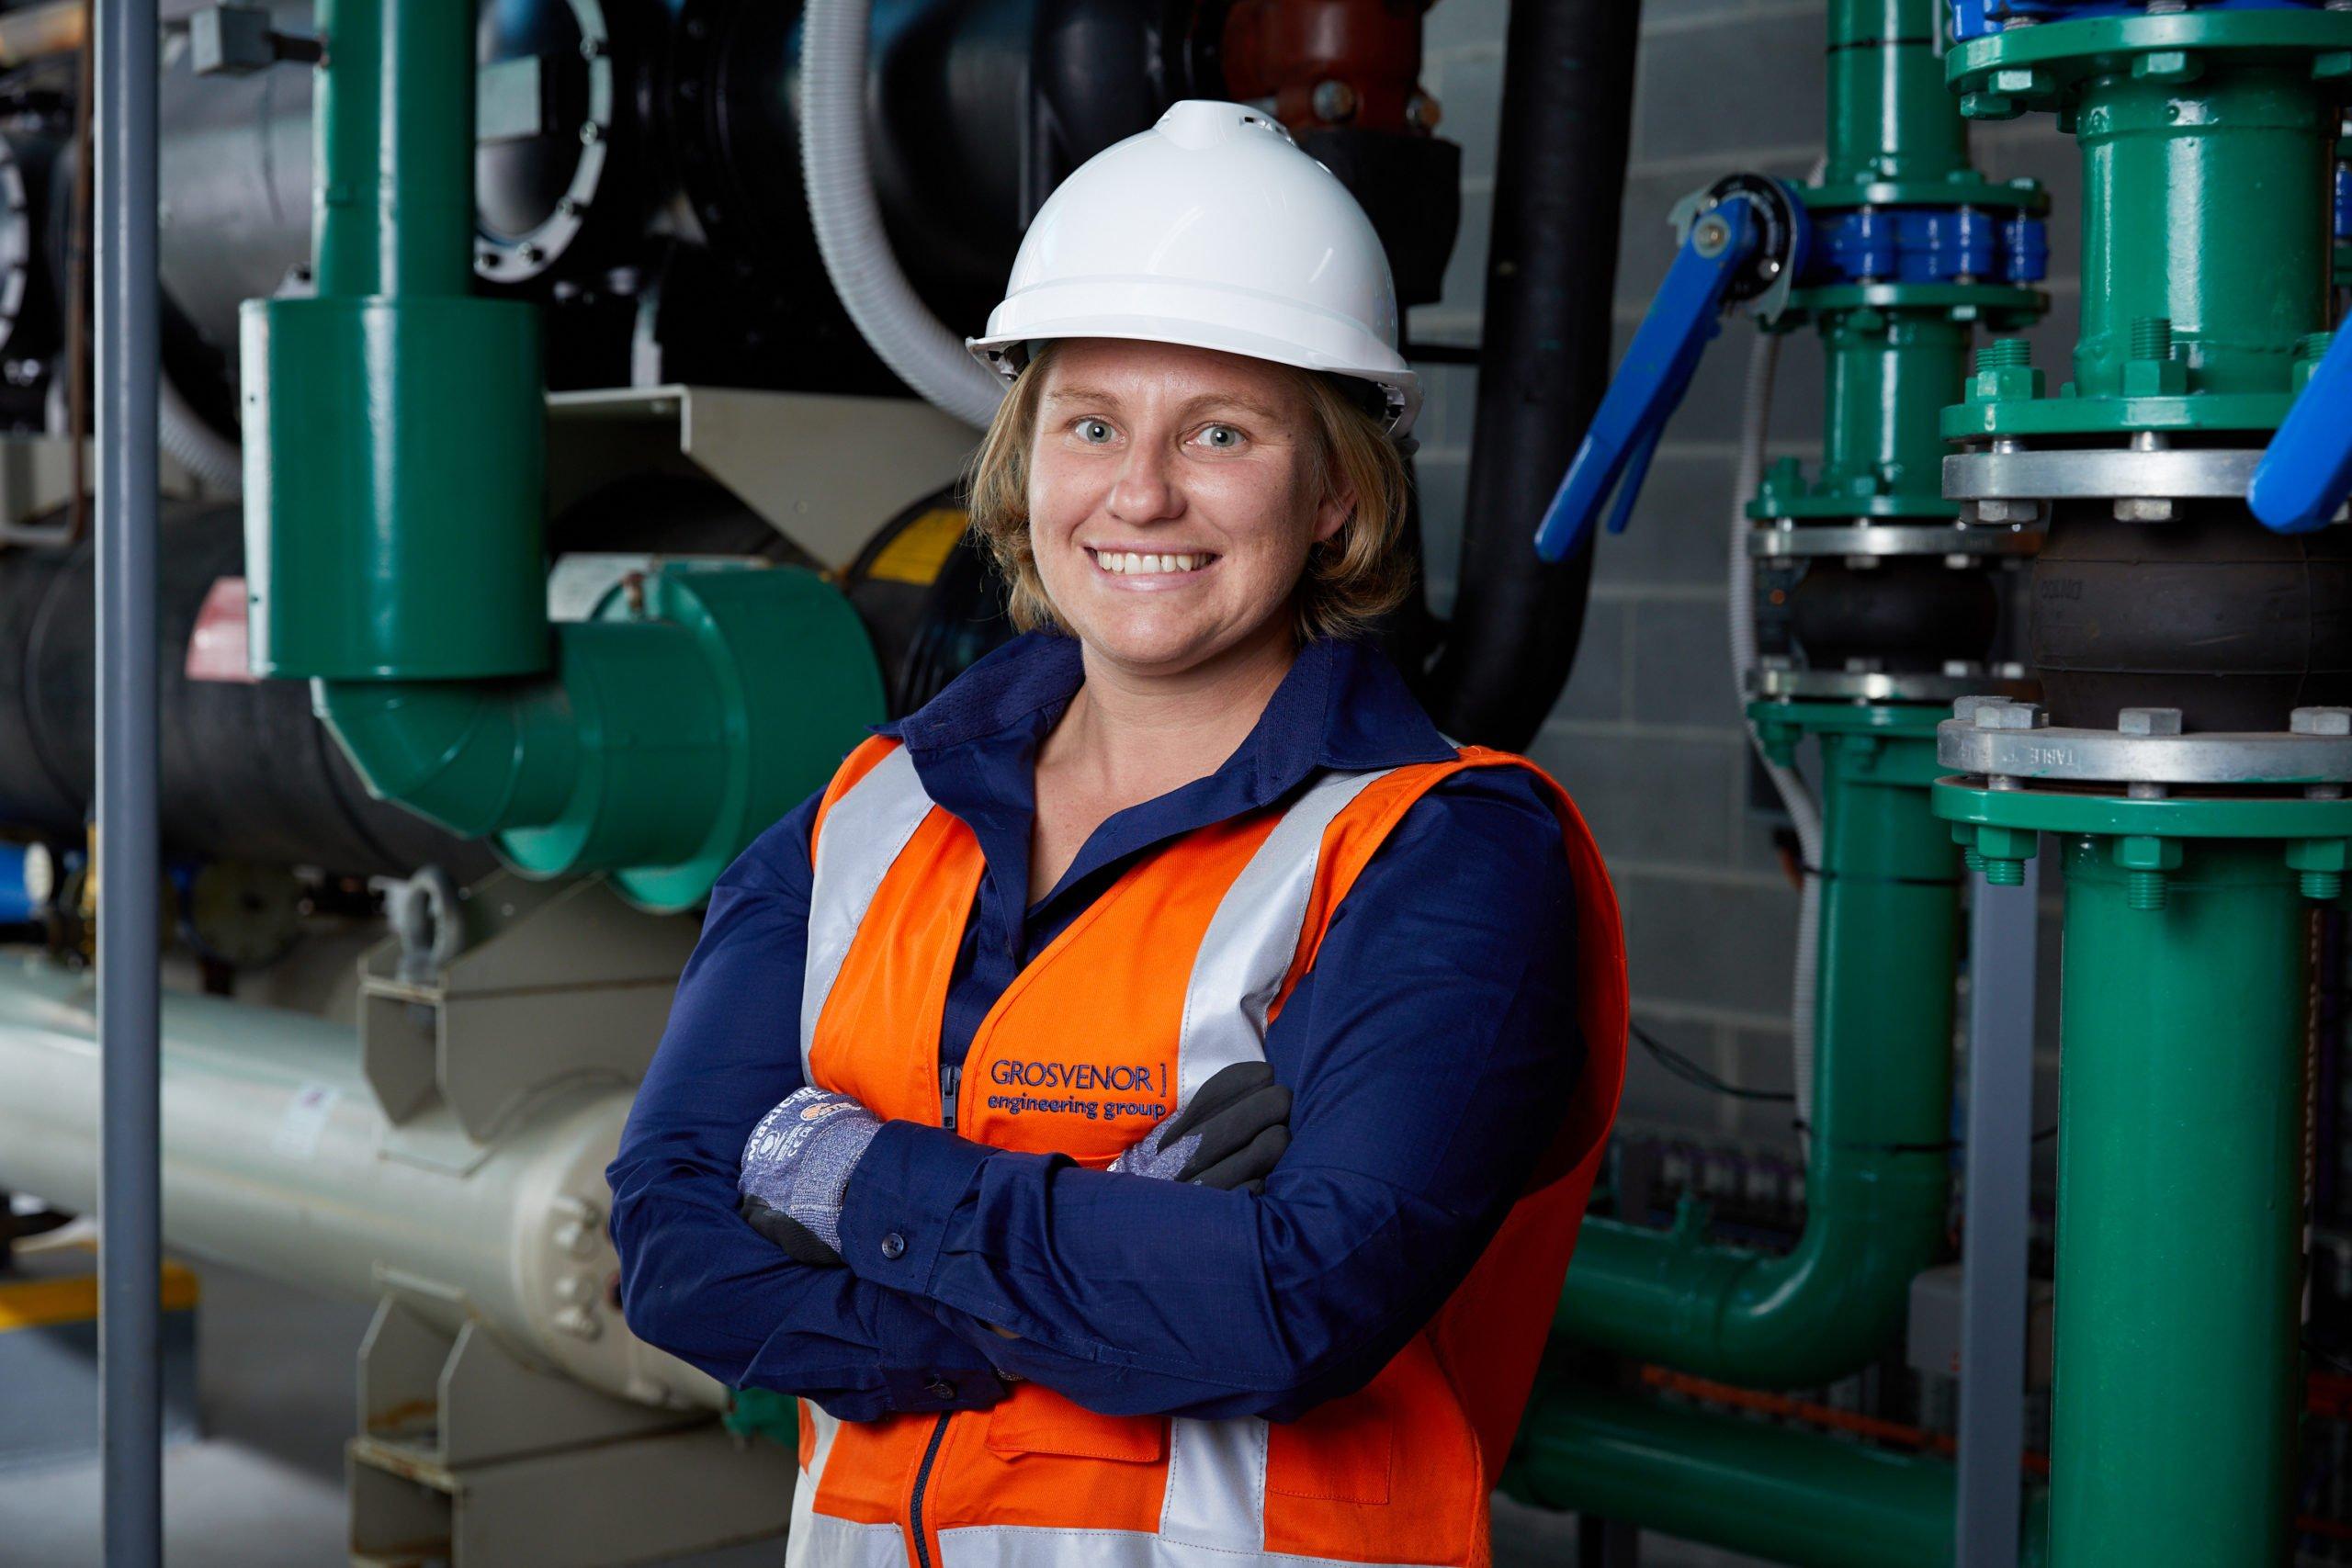 Emma Waine Apprentice at Grosvenor